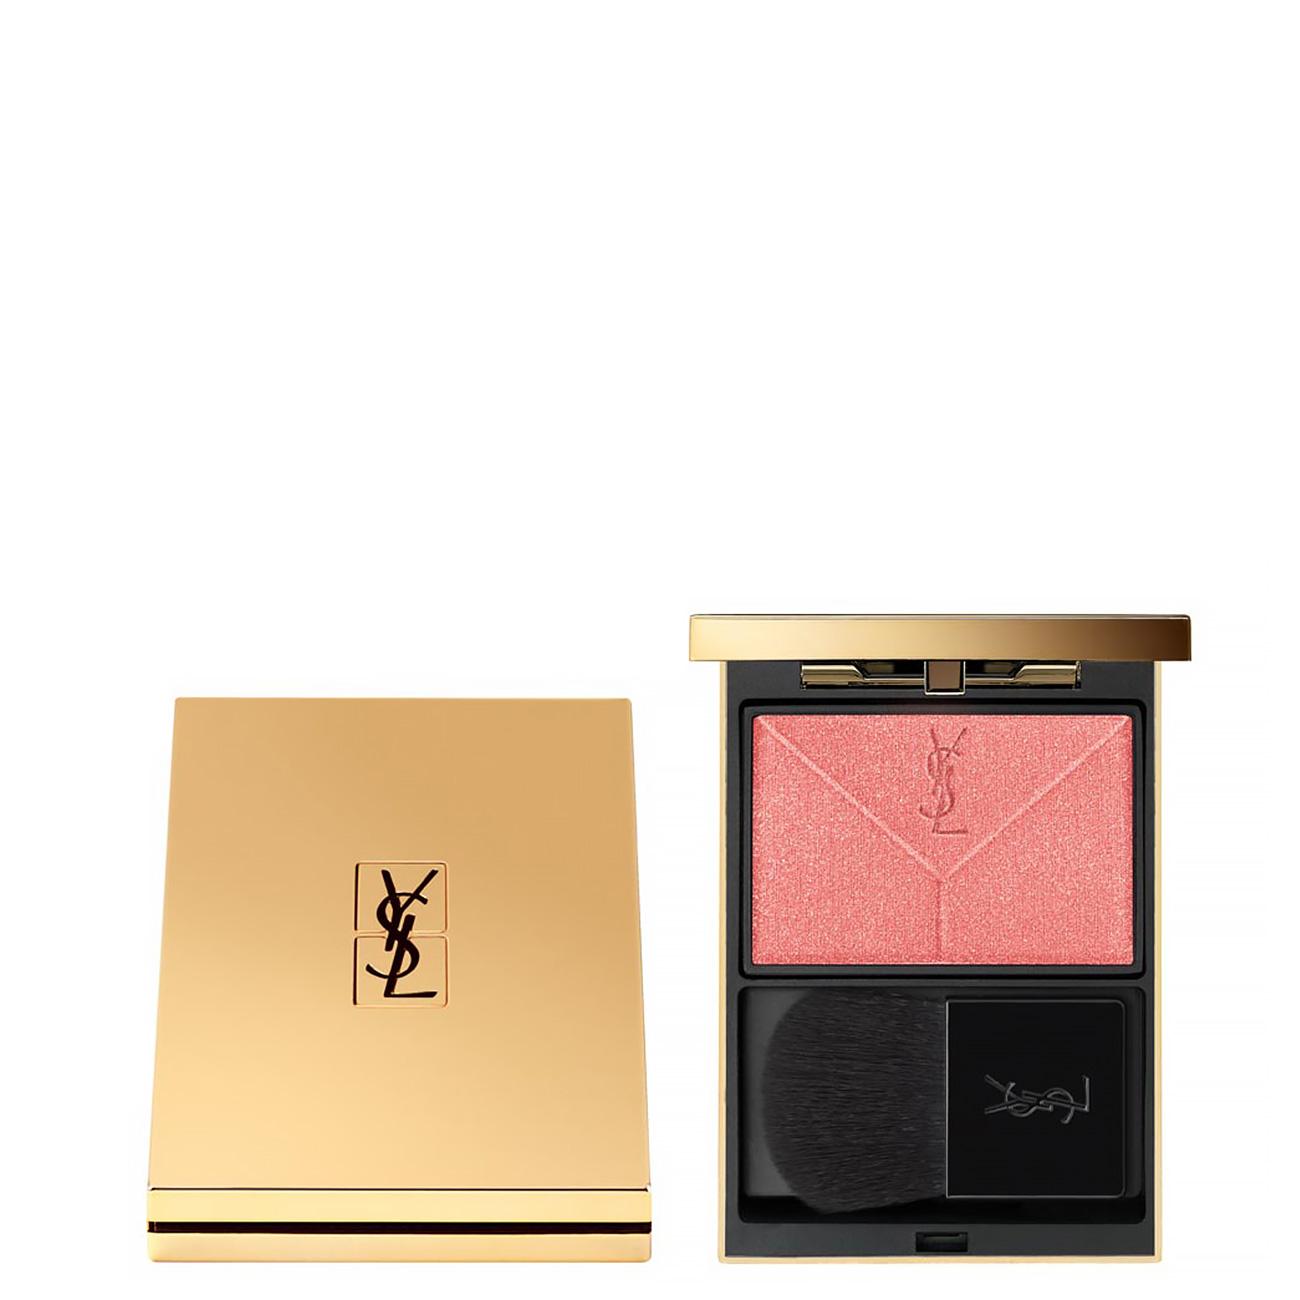 Couture Blush 4 3gr Yves Saint Laurent imagine 2021 bestvalue.eu